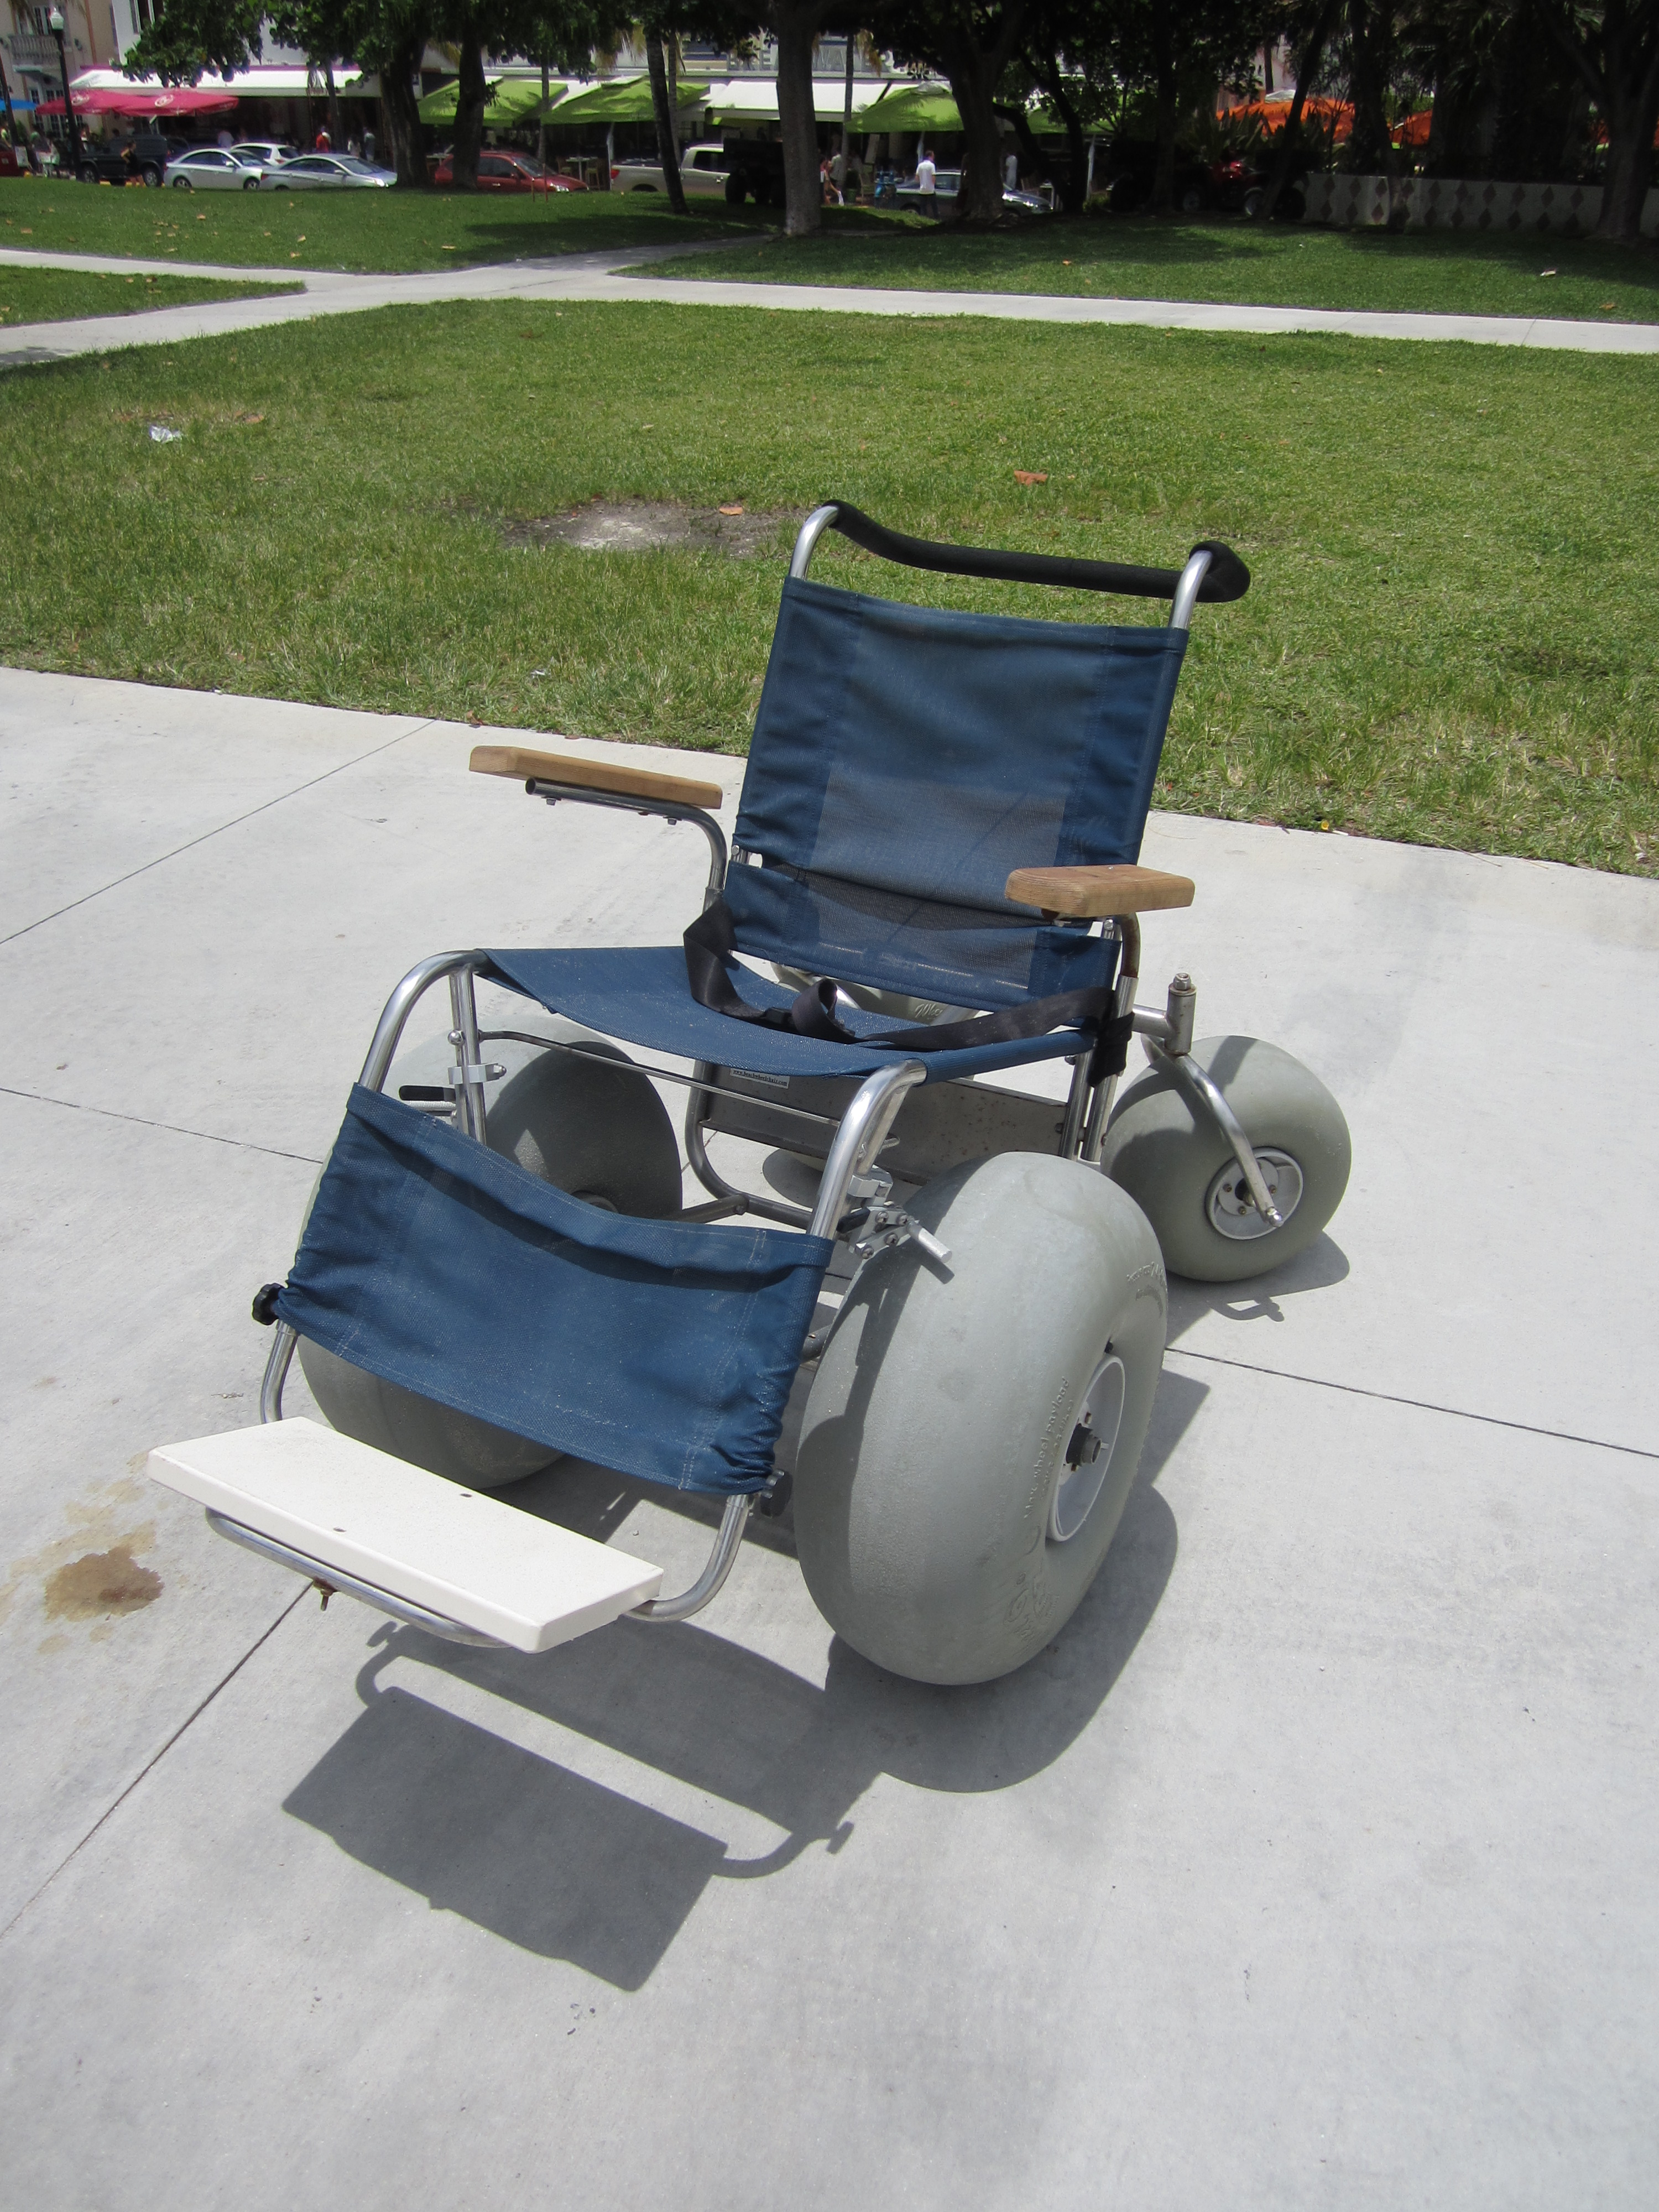 Example of a Manual Beach Wheelchair